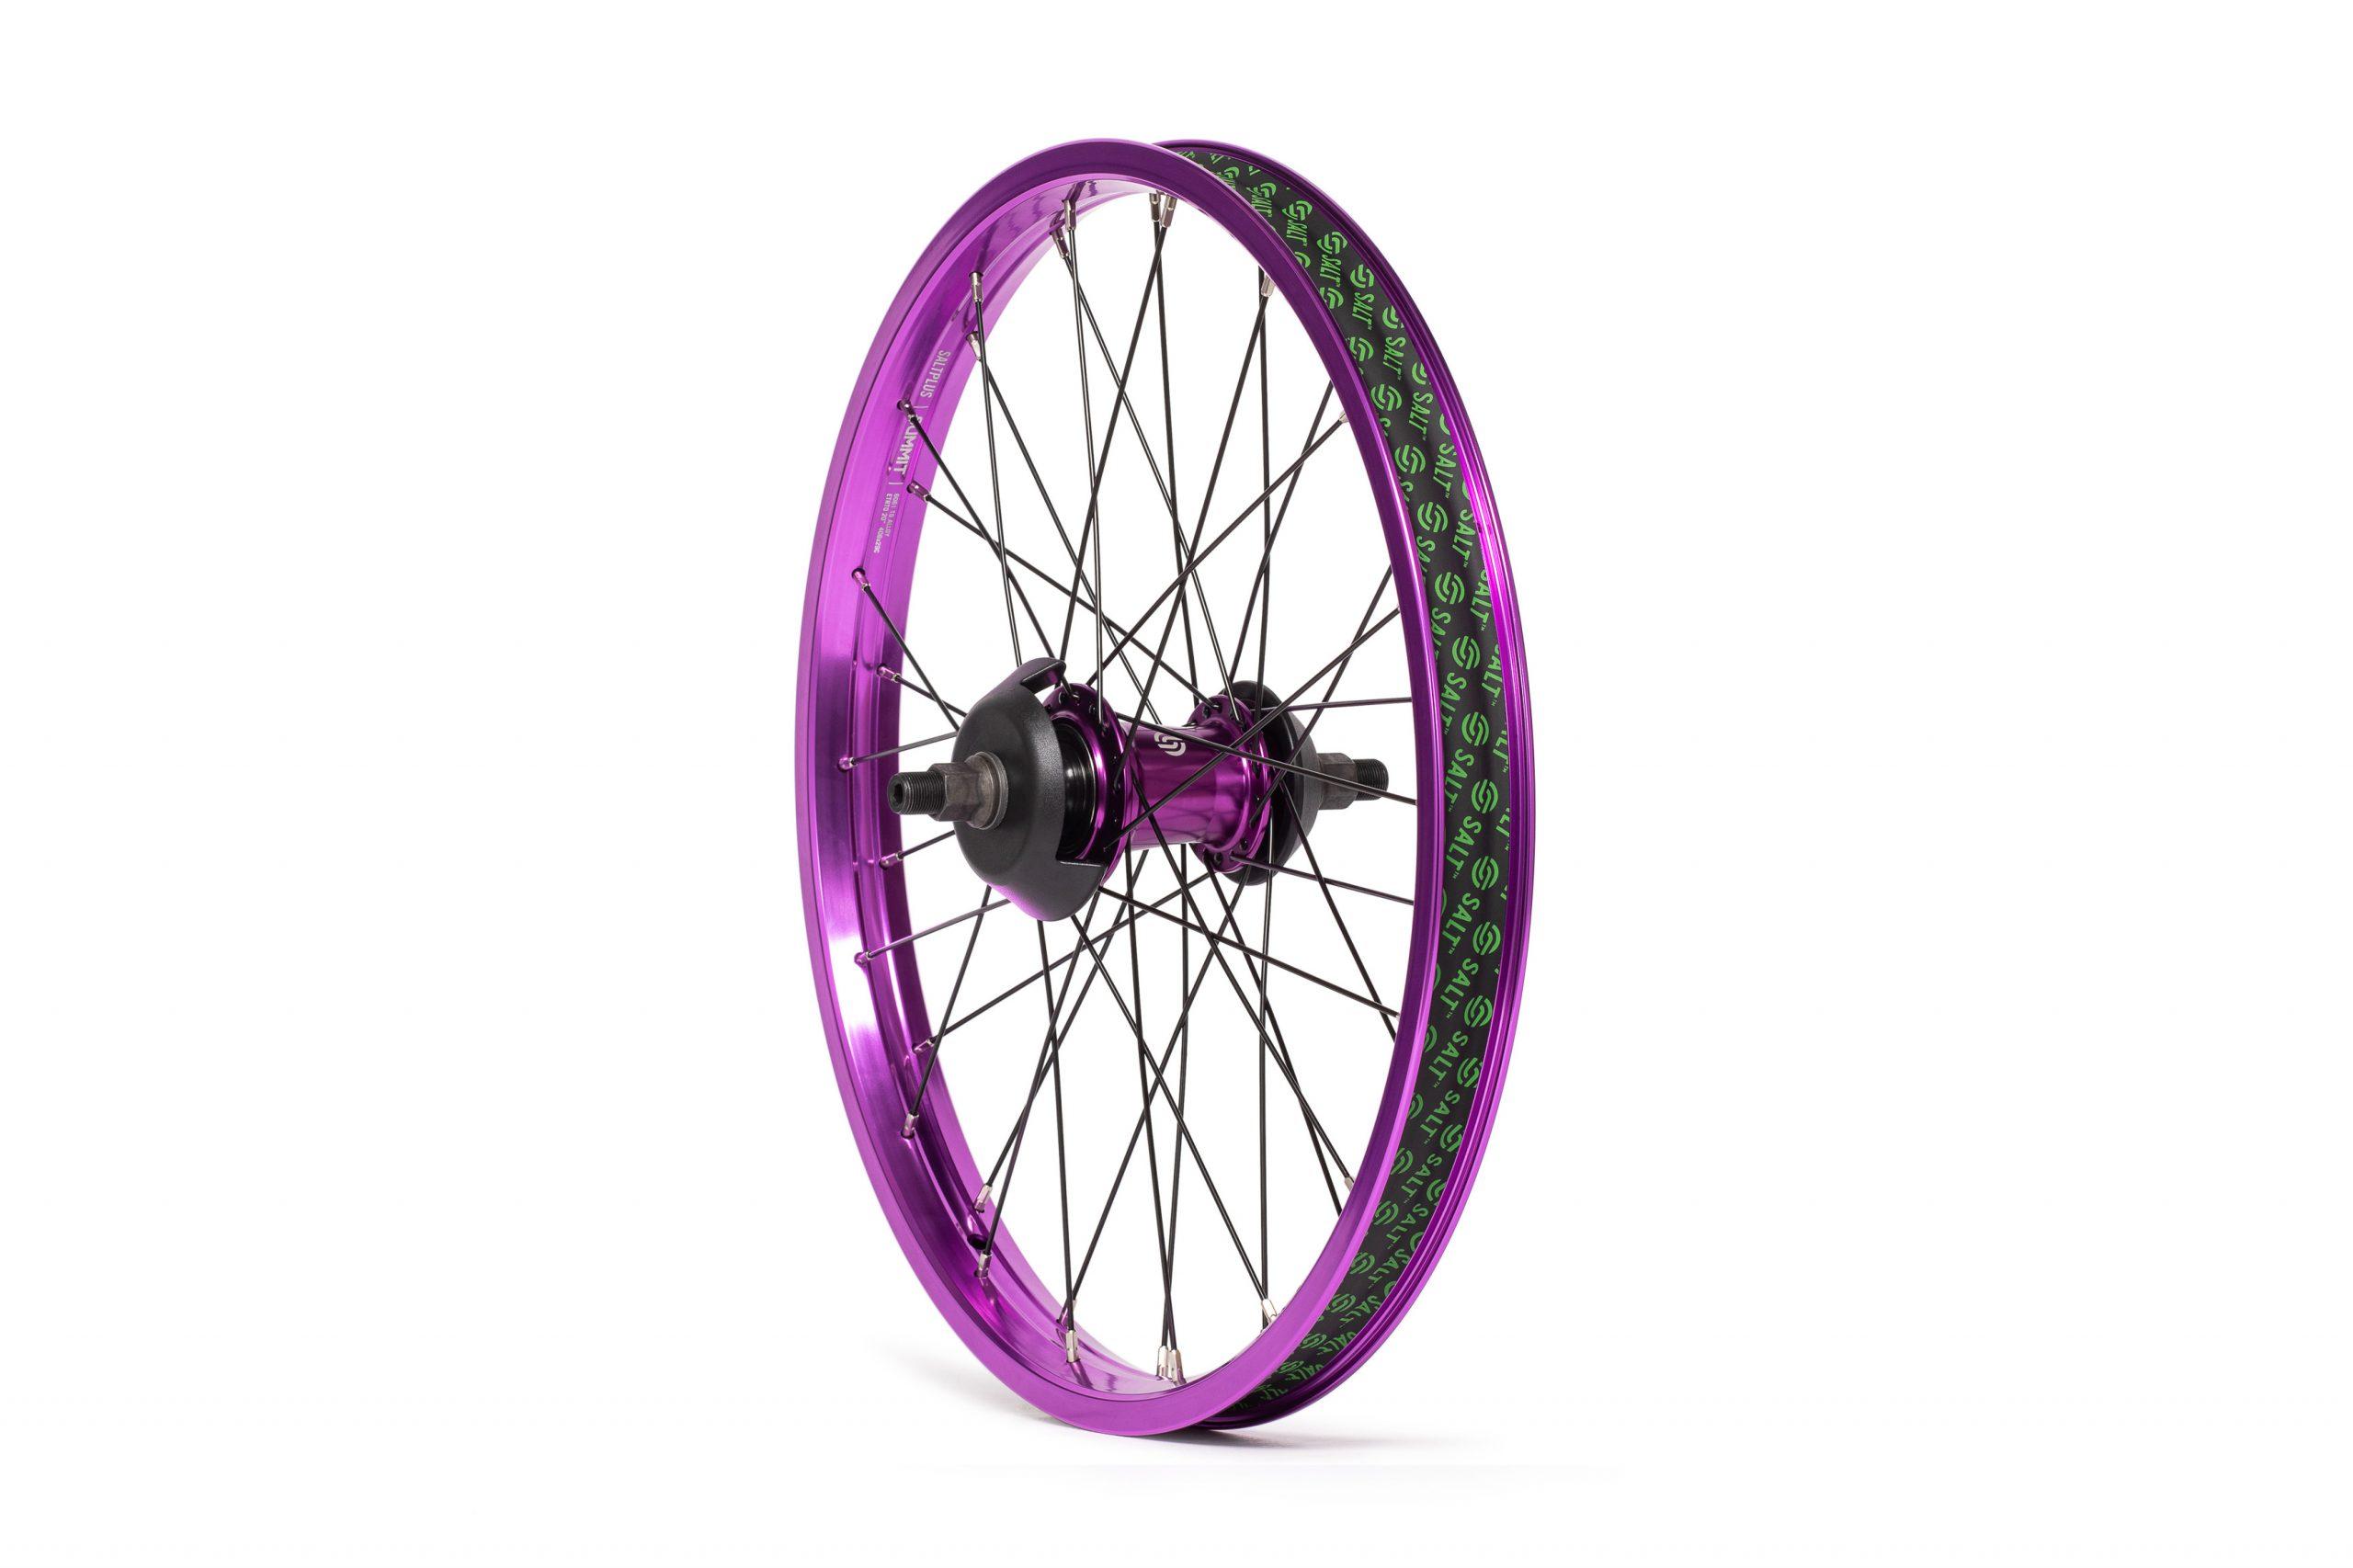 Salt_Everest_FC_rear_wheel_purple-02